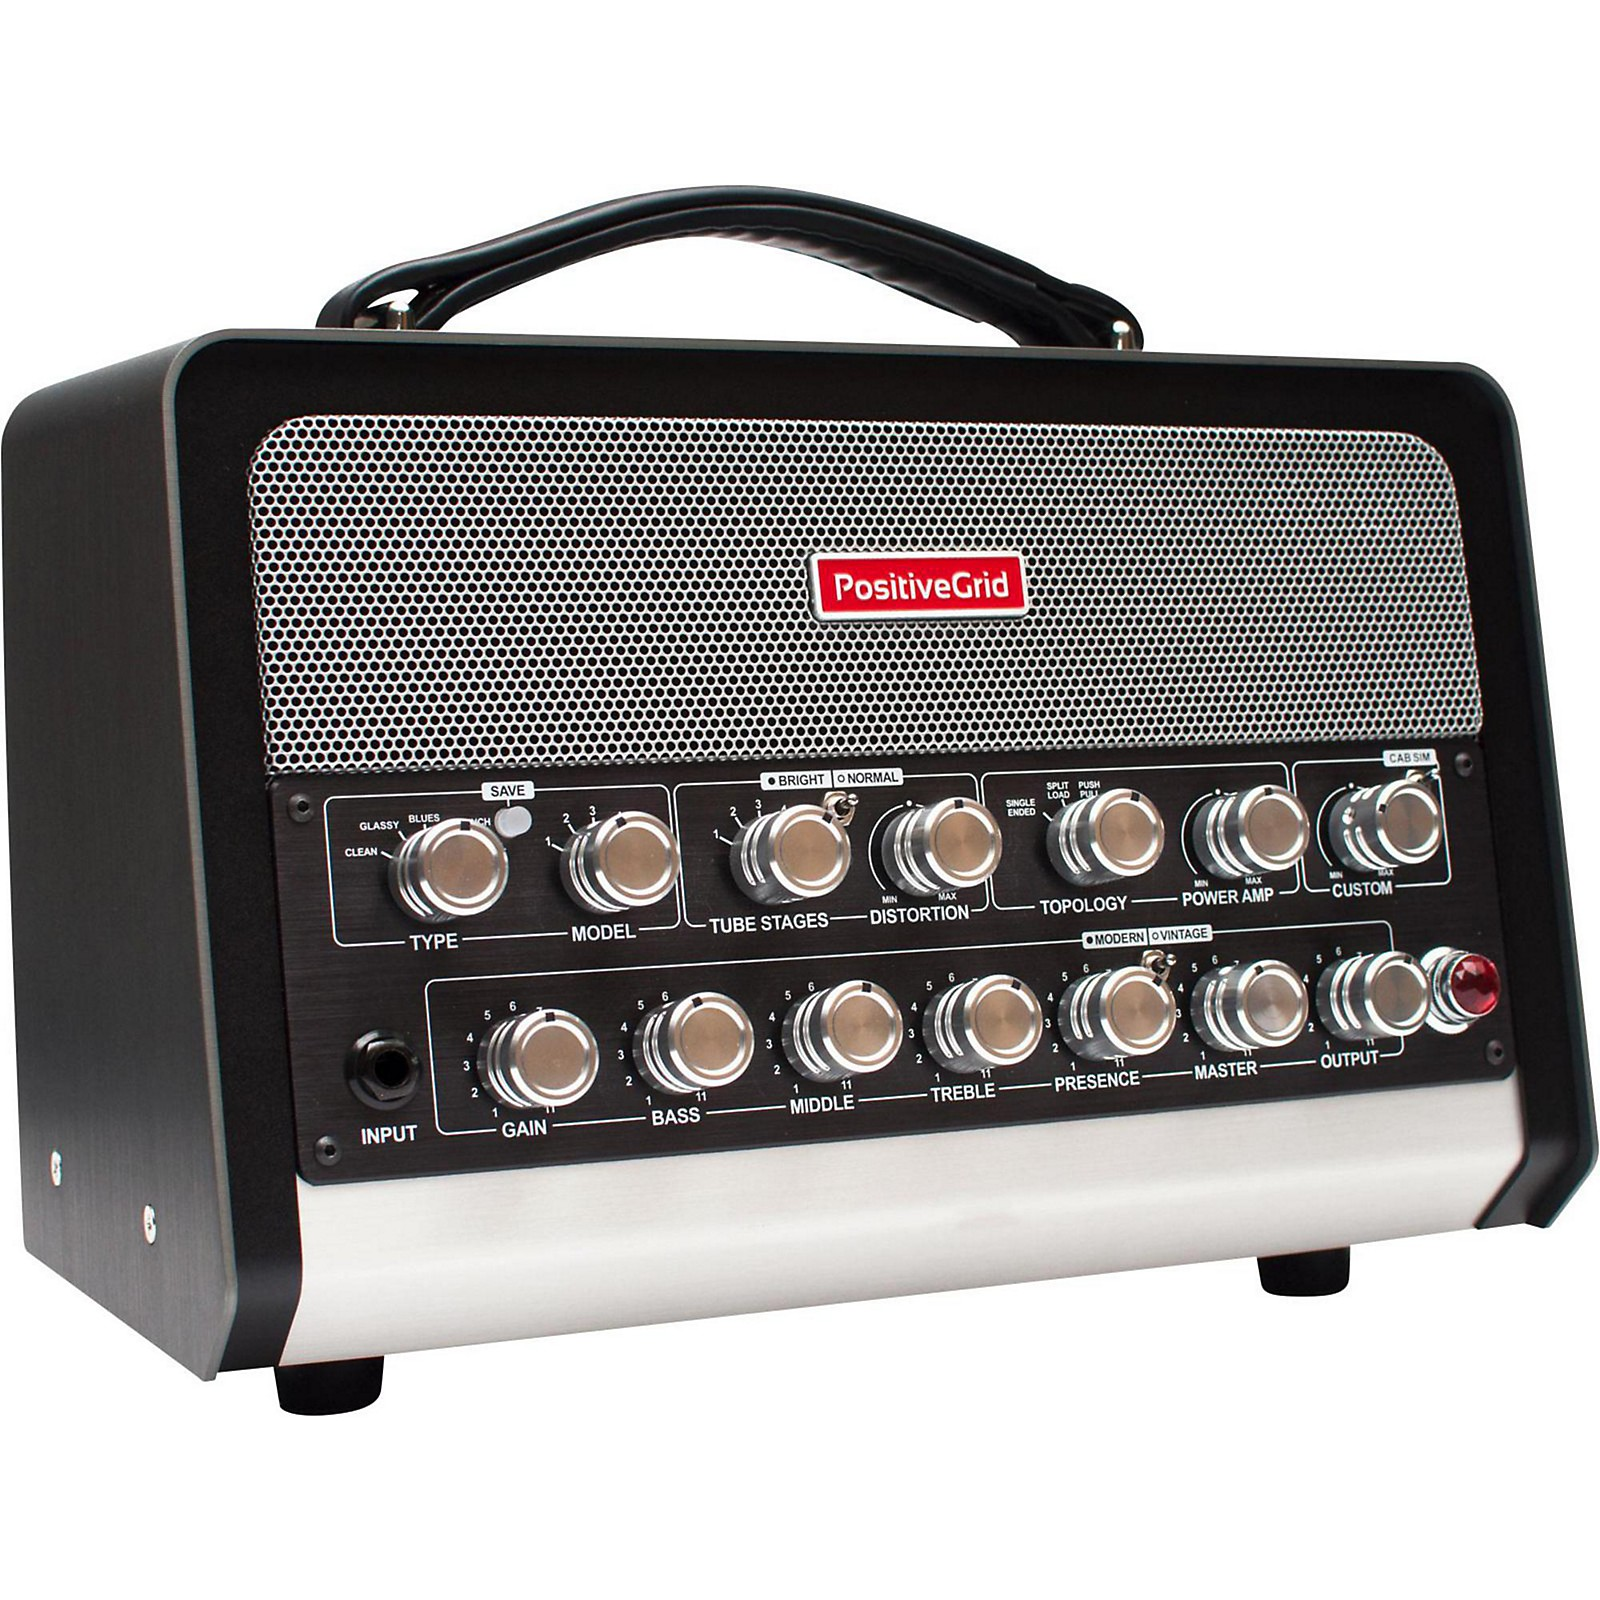 Positive Grid BIAS 600W Guitar and Bass Amplifier Head